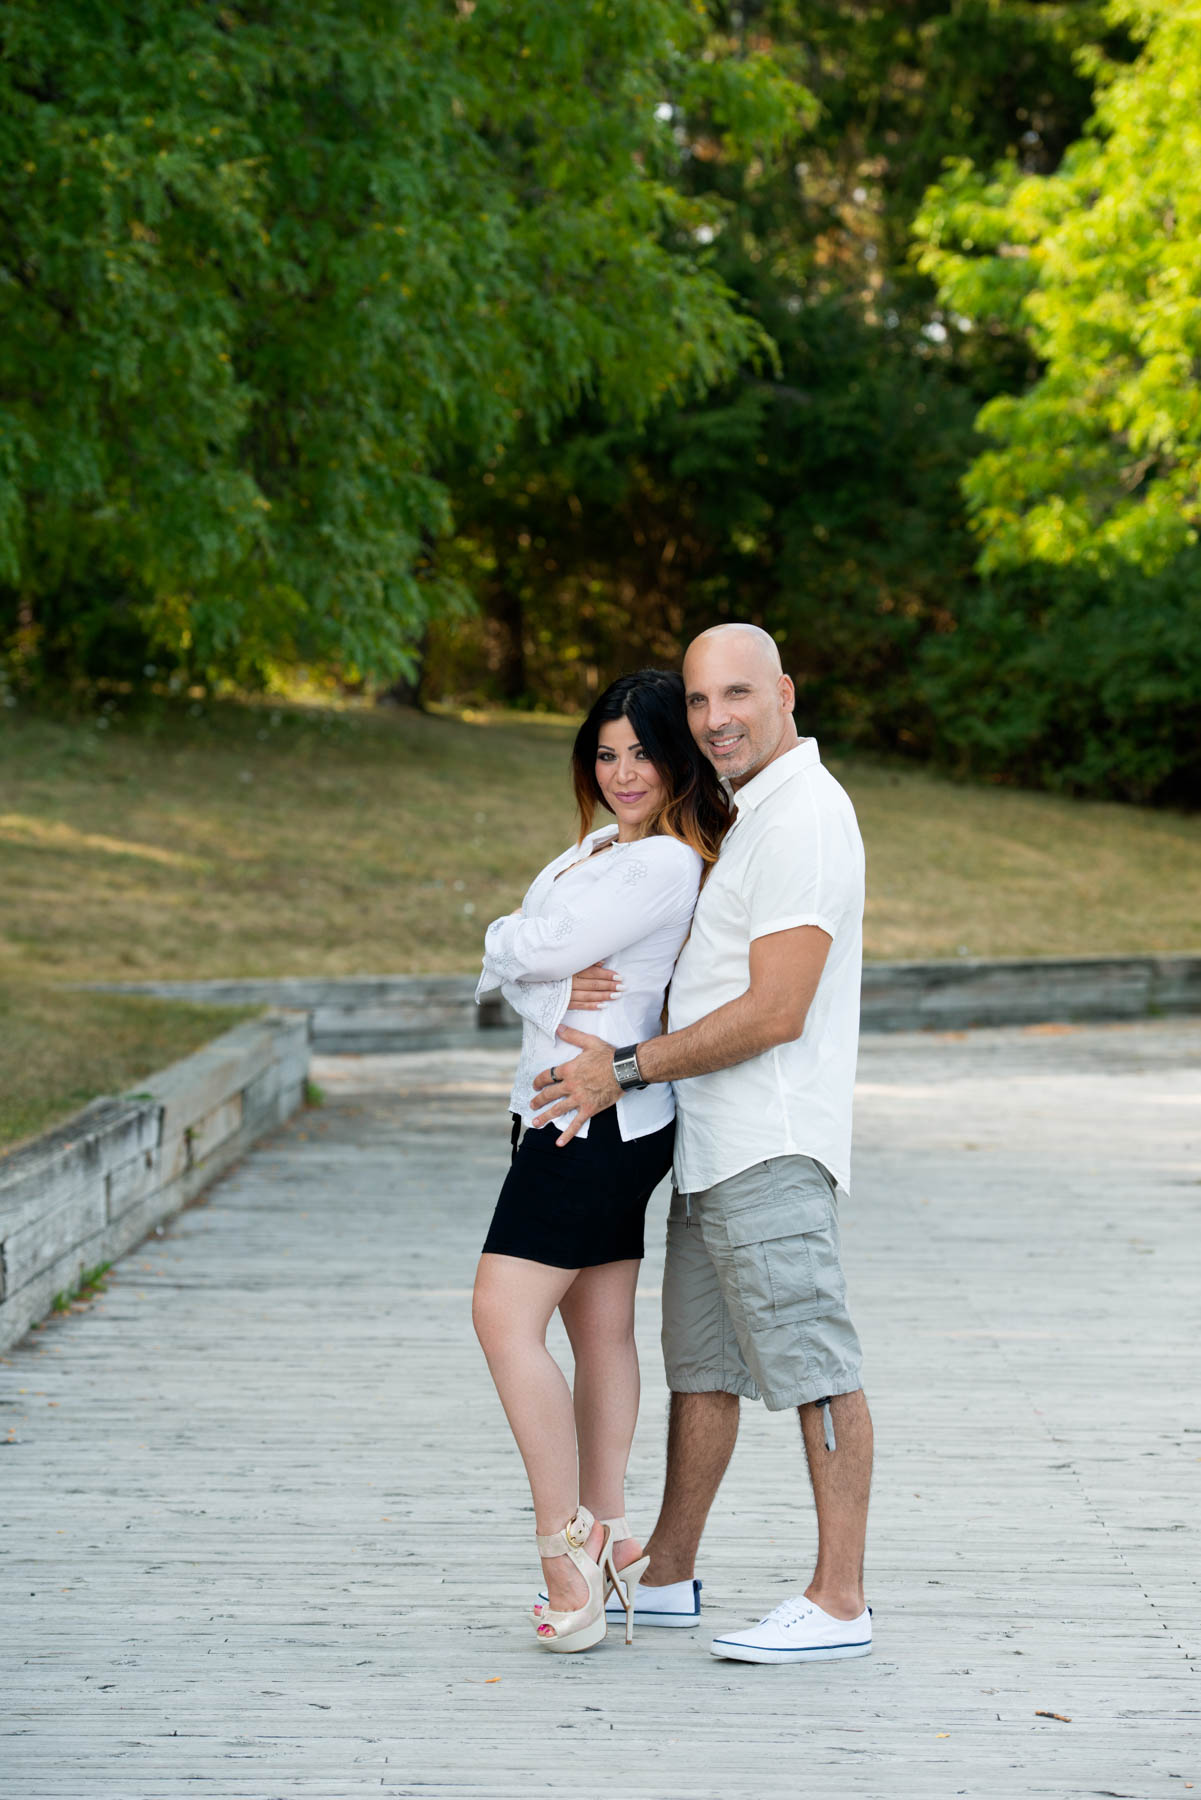 009 - Engagement FL Humber Bay Park - Toronto